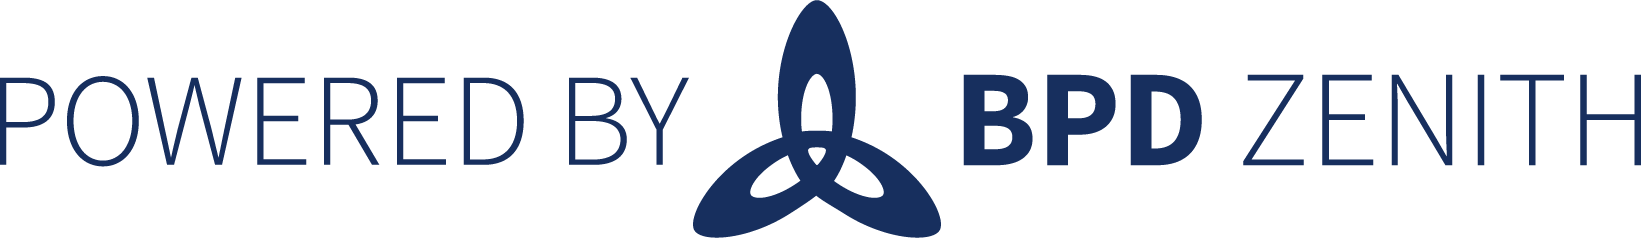 BPDZenith_logo_poweredby